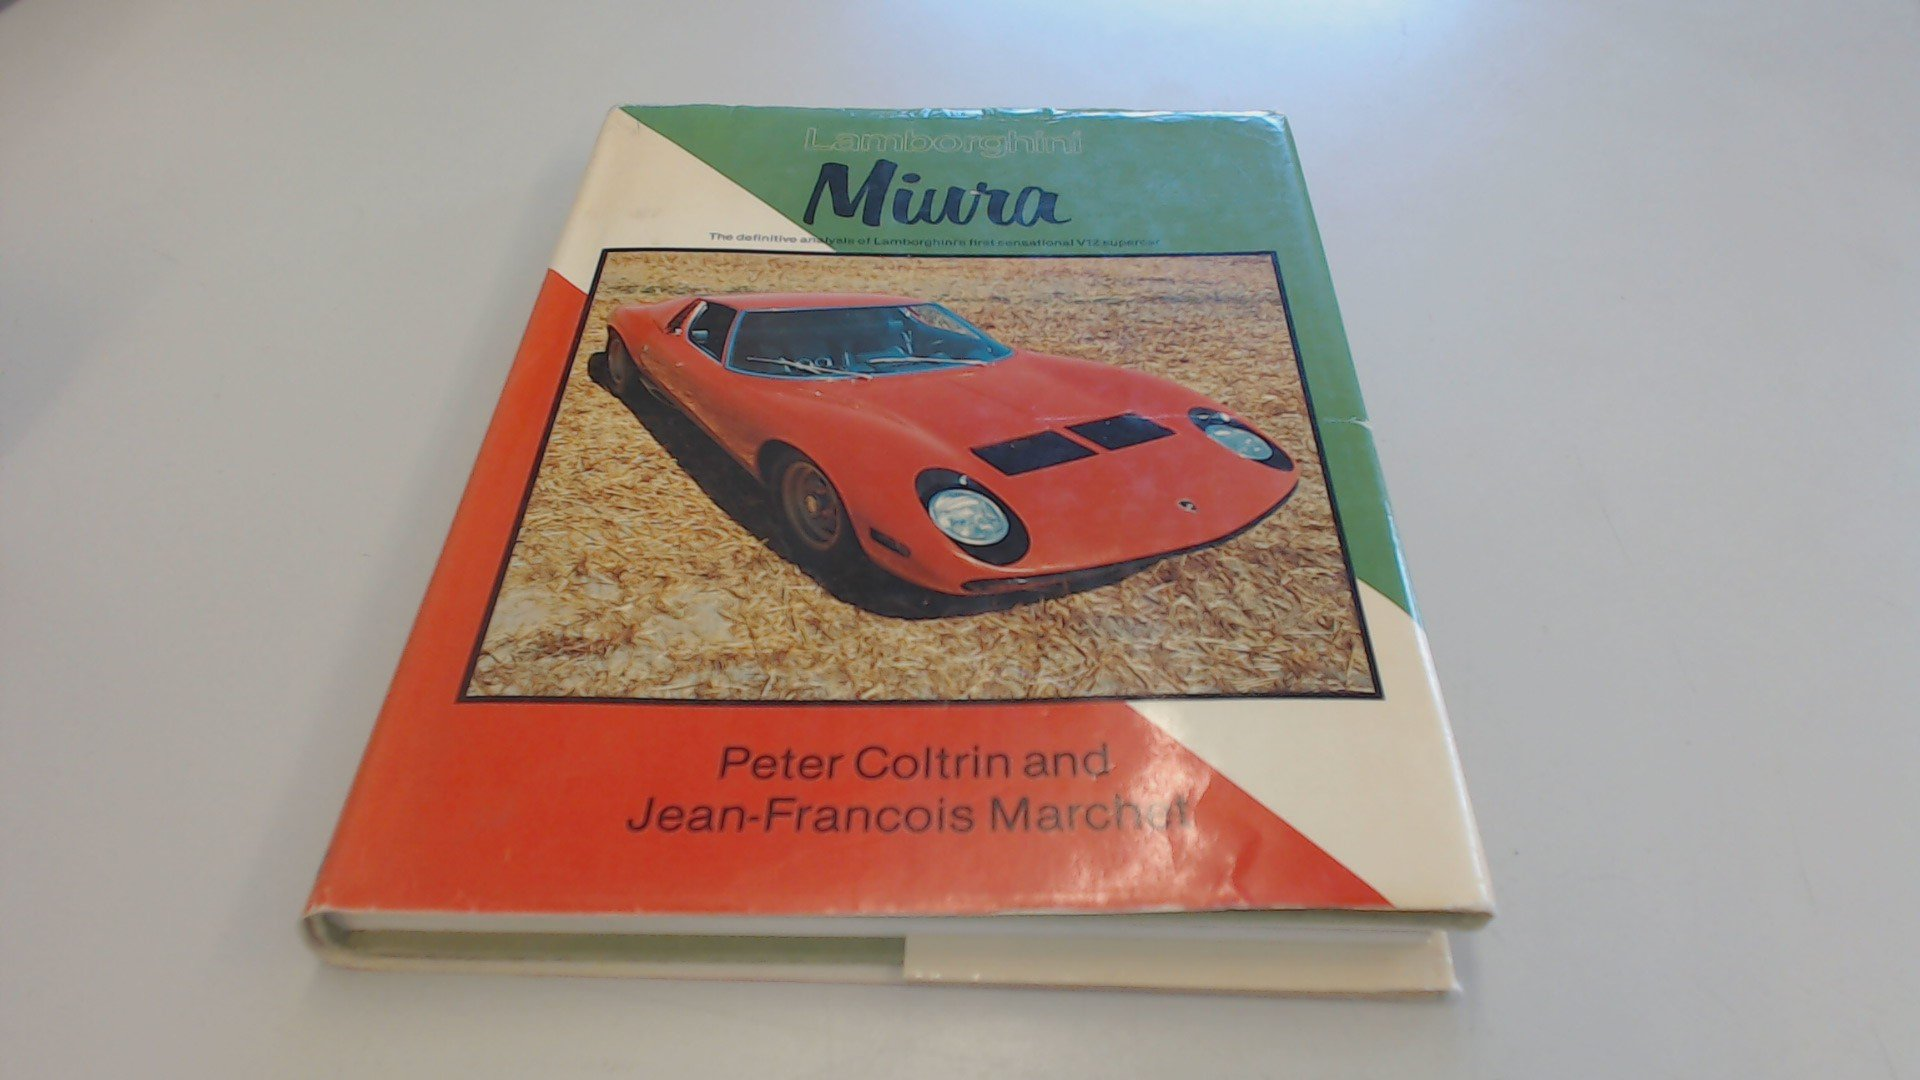 Lamborghini Miura The Definitive Analysis Of Lamborghini S First